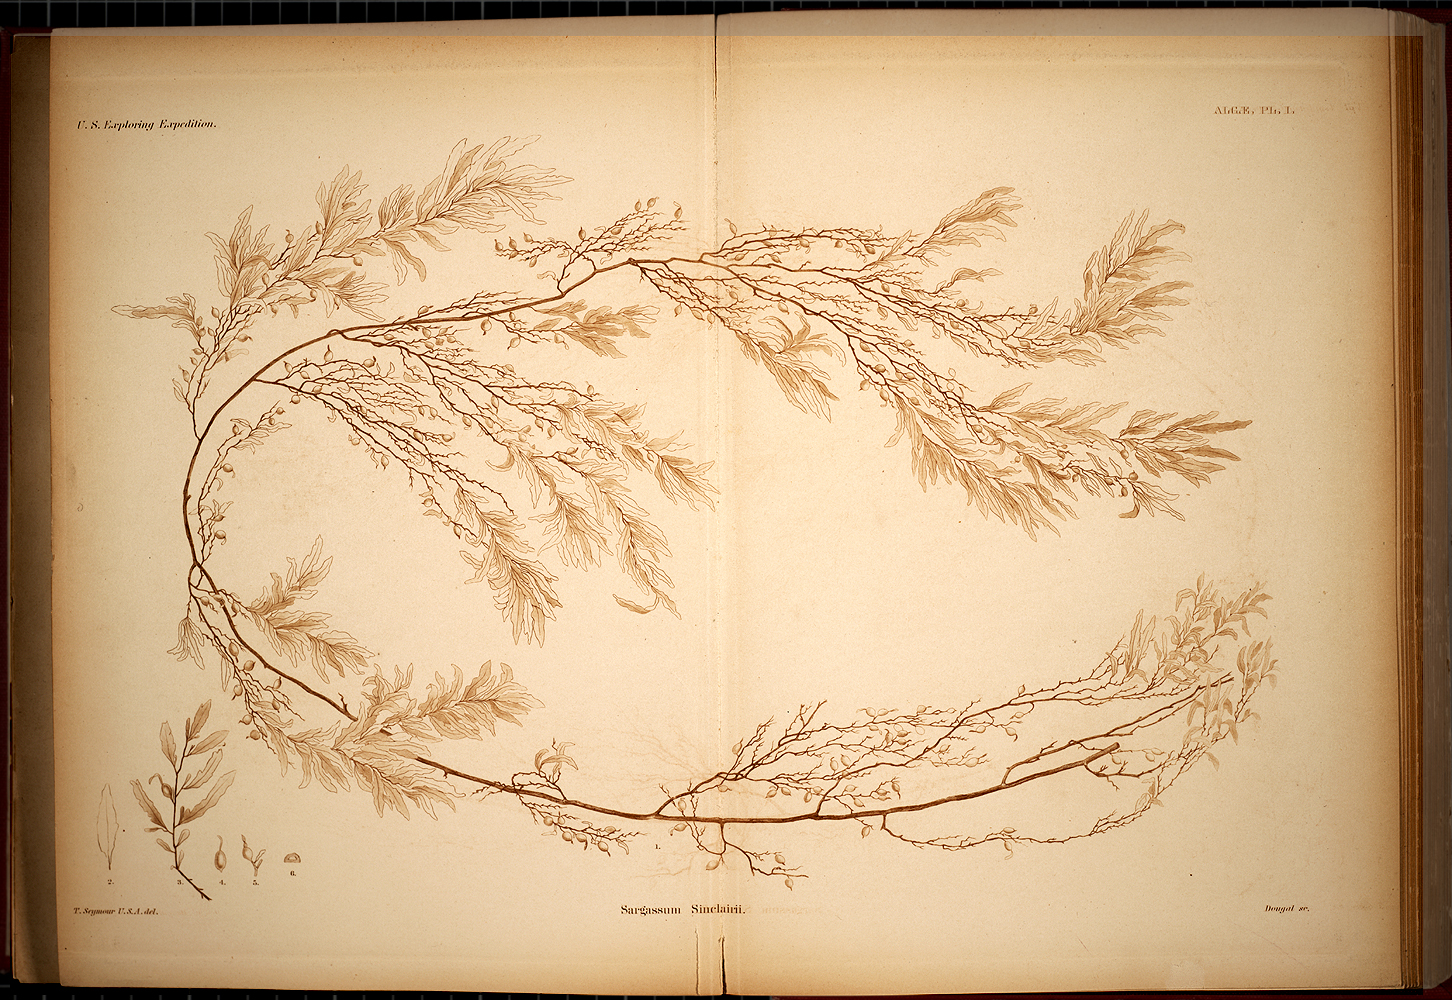 Algae, Plate I,  Image number:SIL19-28-001